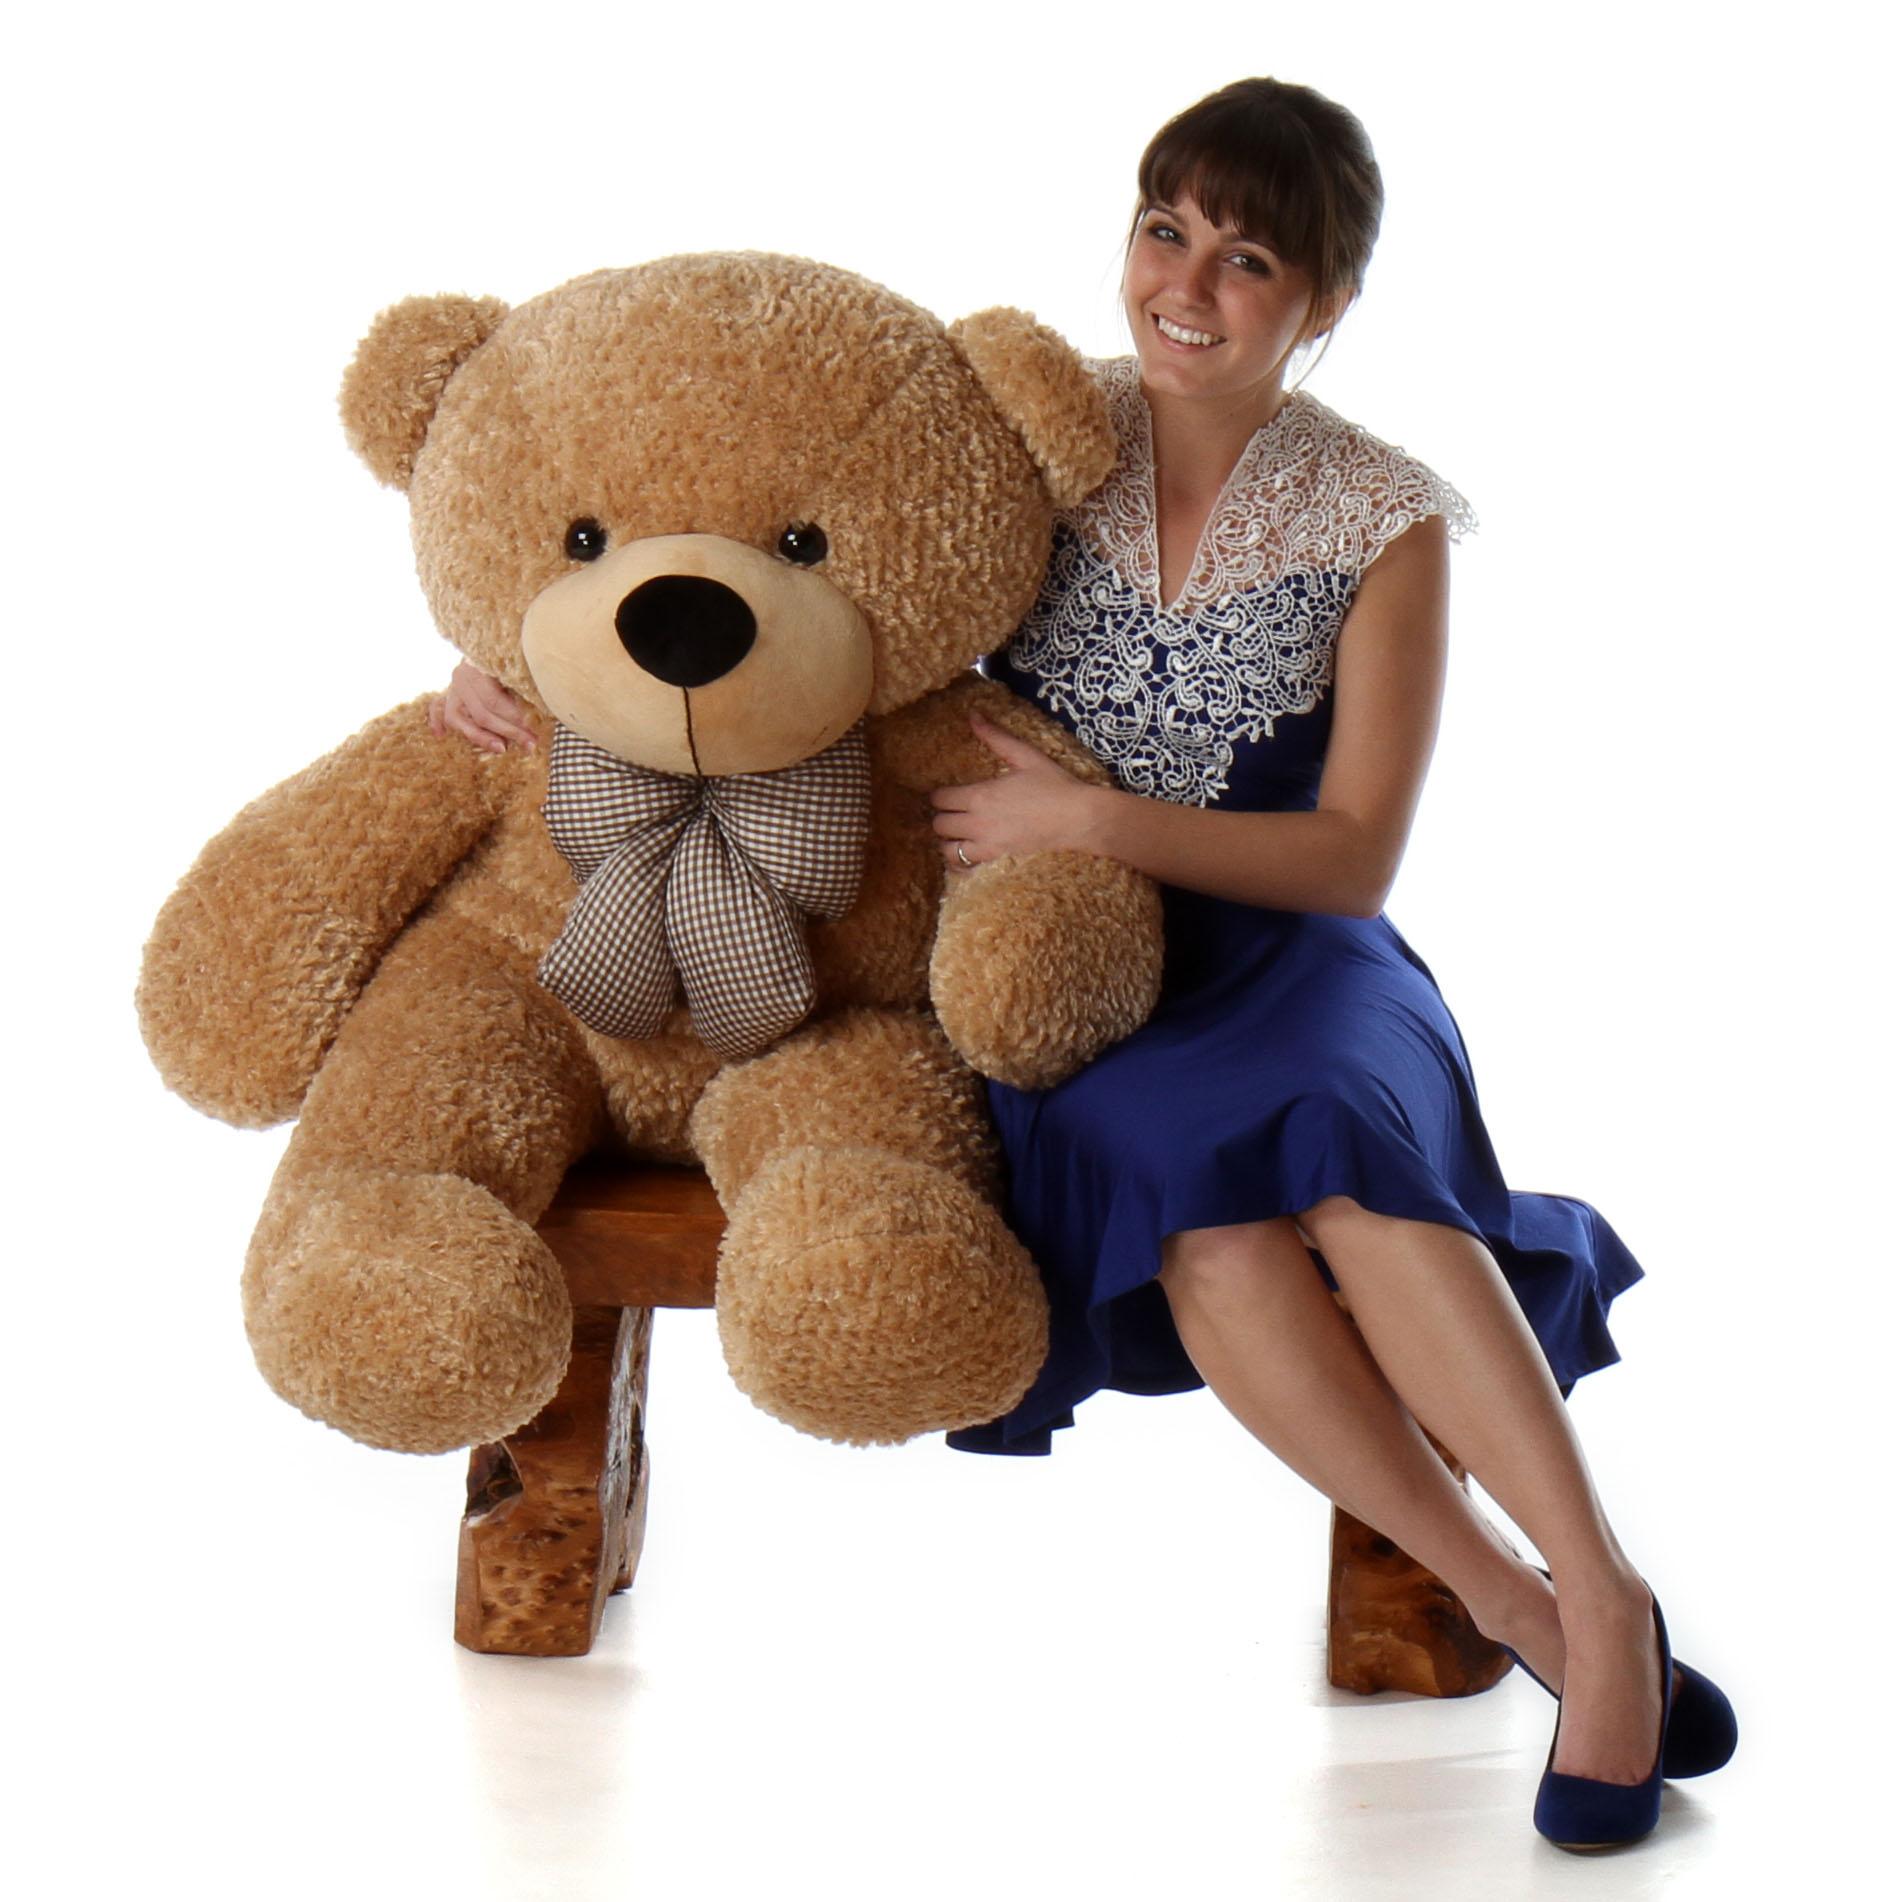 4ft-life-size-teddy-bear-shaggy-cuddles-soft-amber-brown-fur.jpg